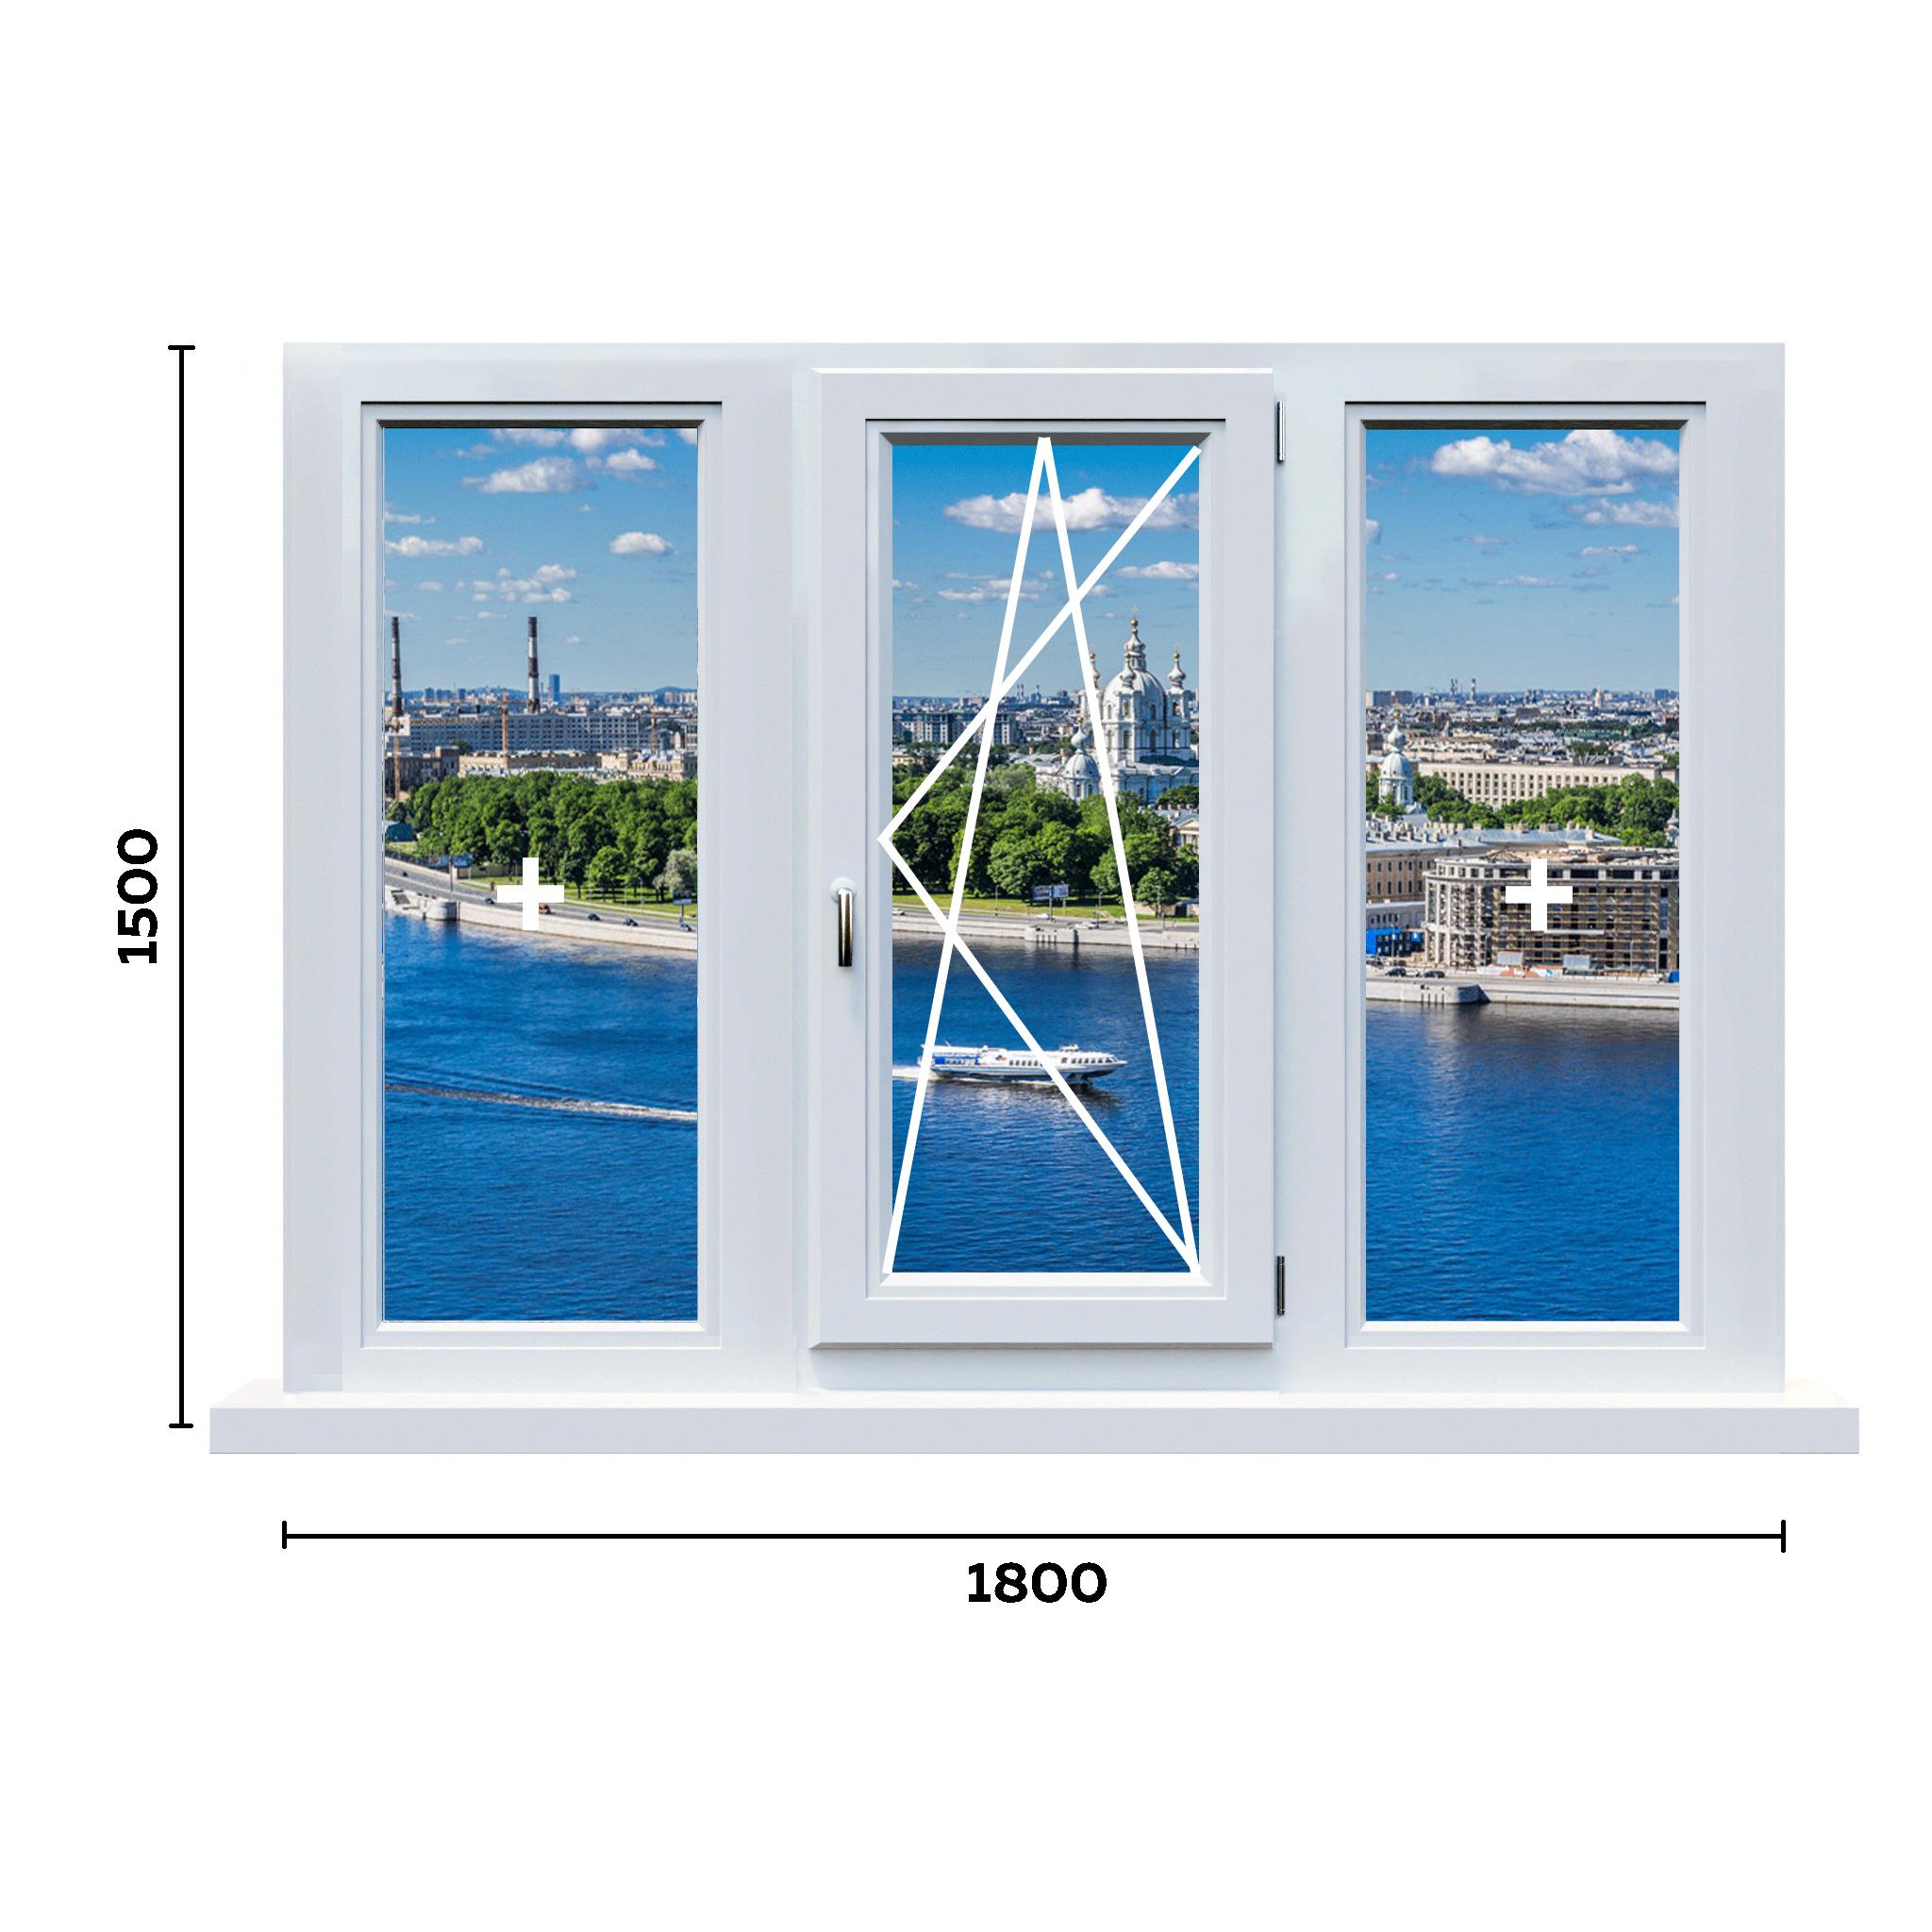 схема окна 1800мм вариант 1